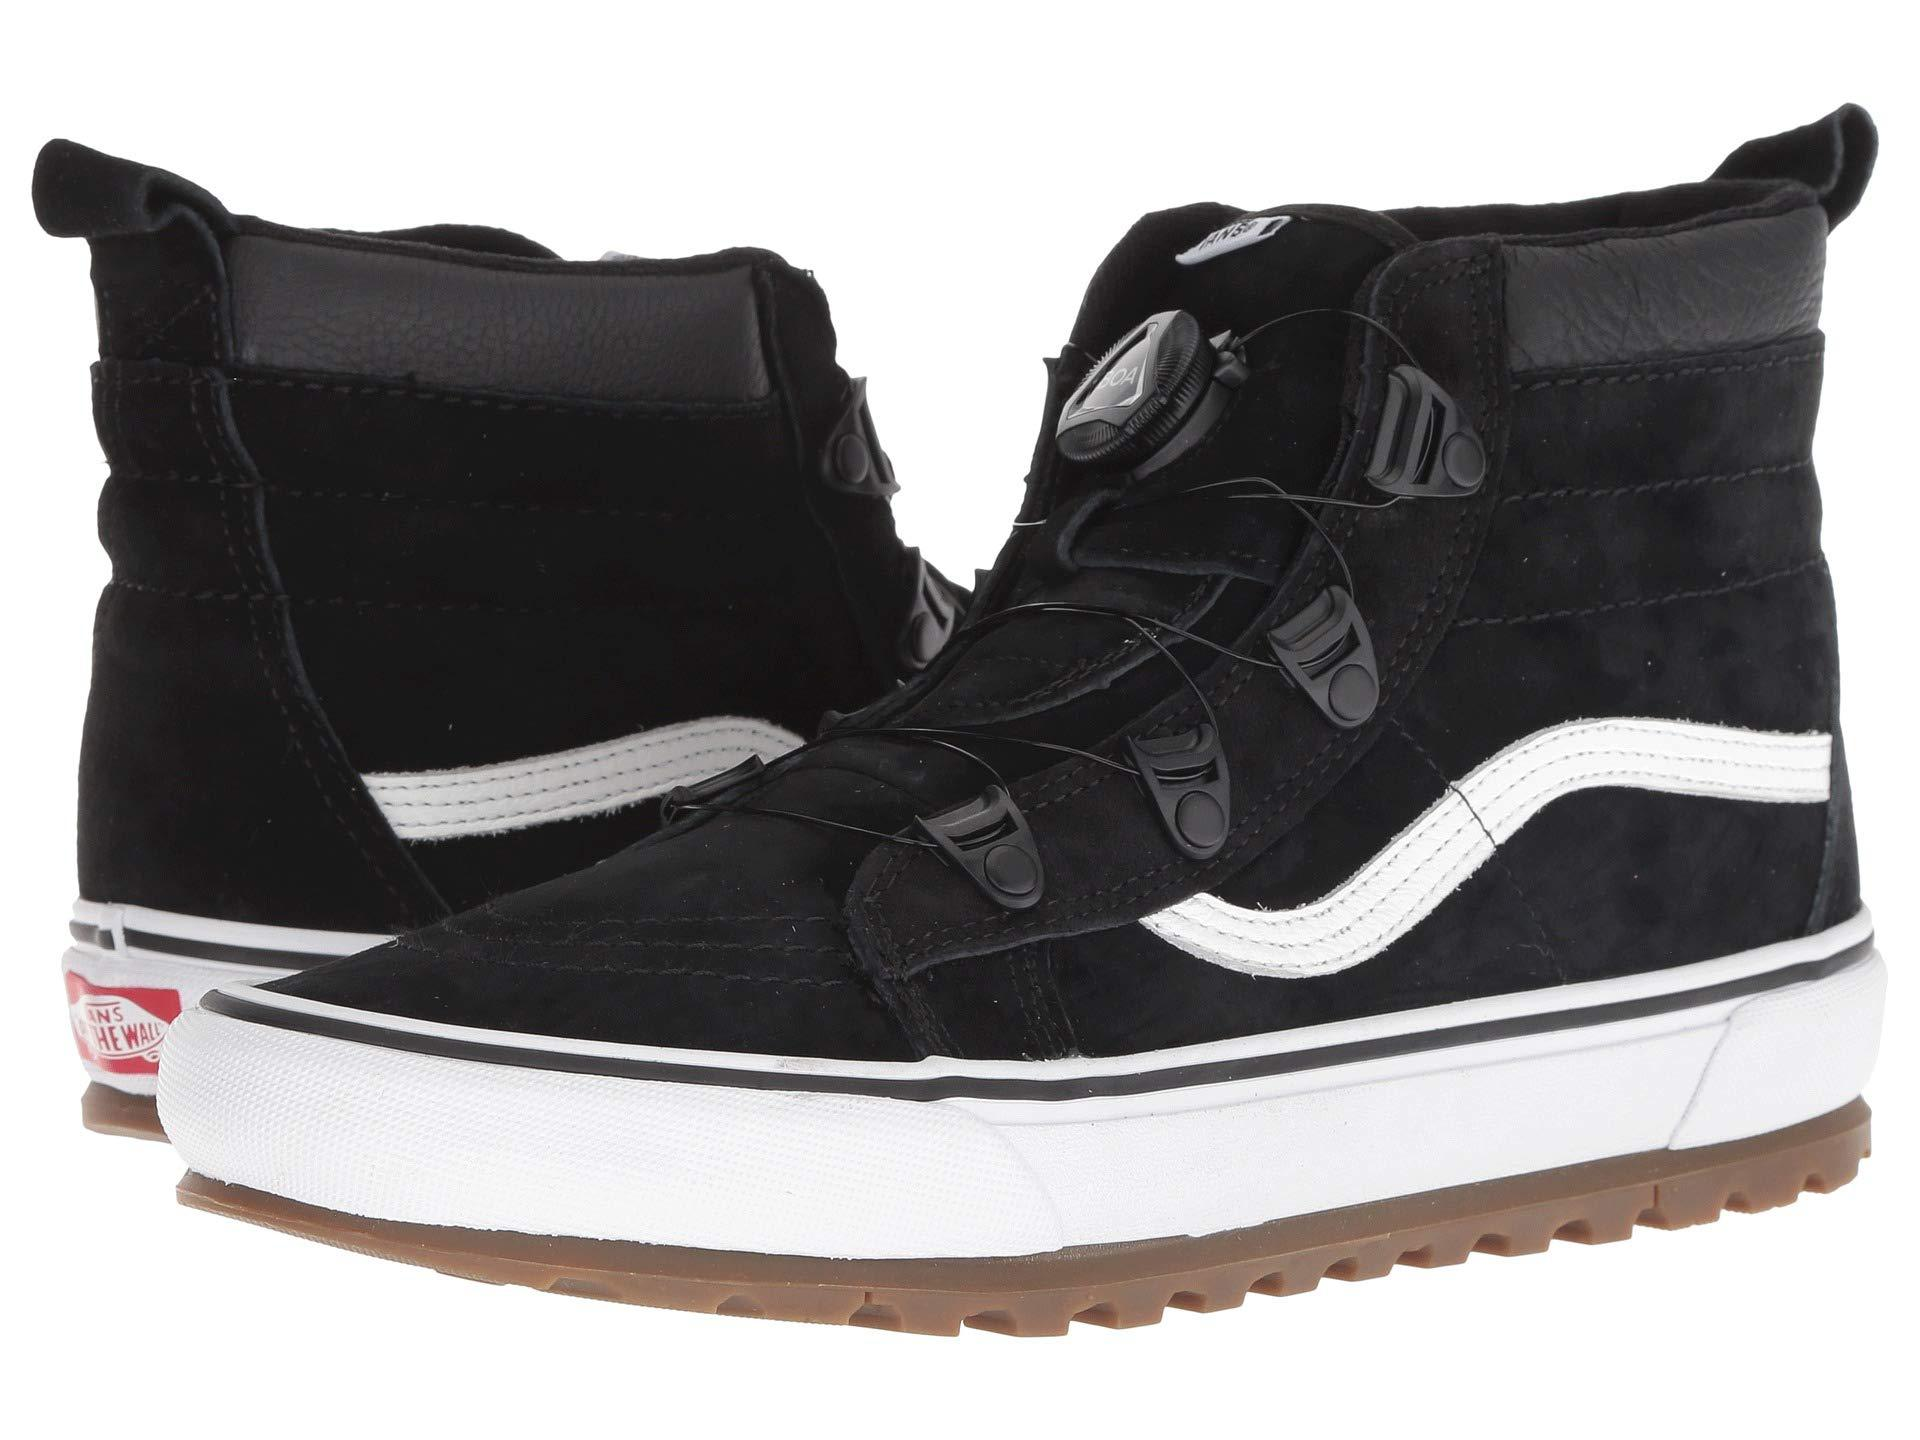 b4e03d4ea6 Lyst - Vans Sk8-hi Mte Boa (black true White) Shoes in Black for Men